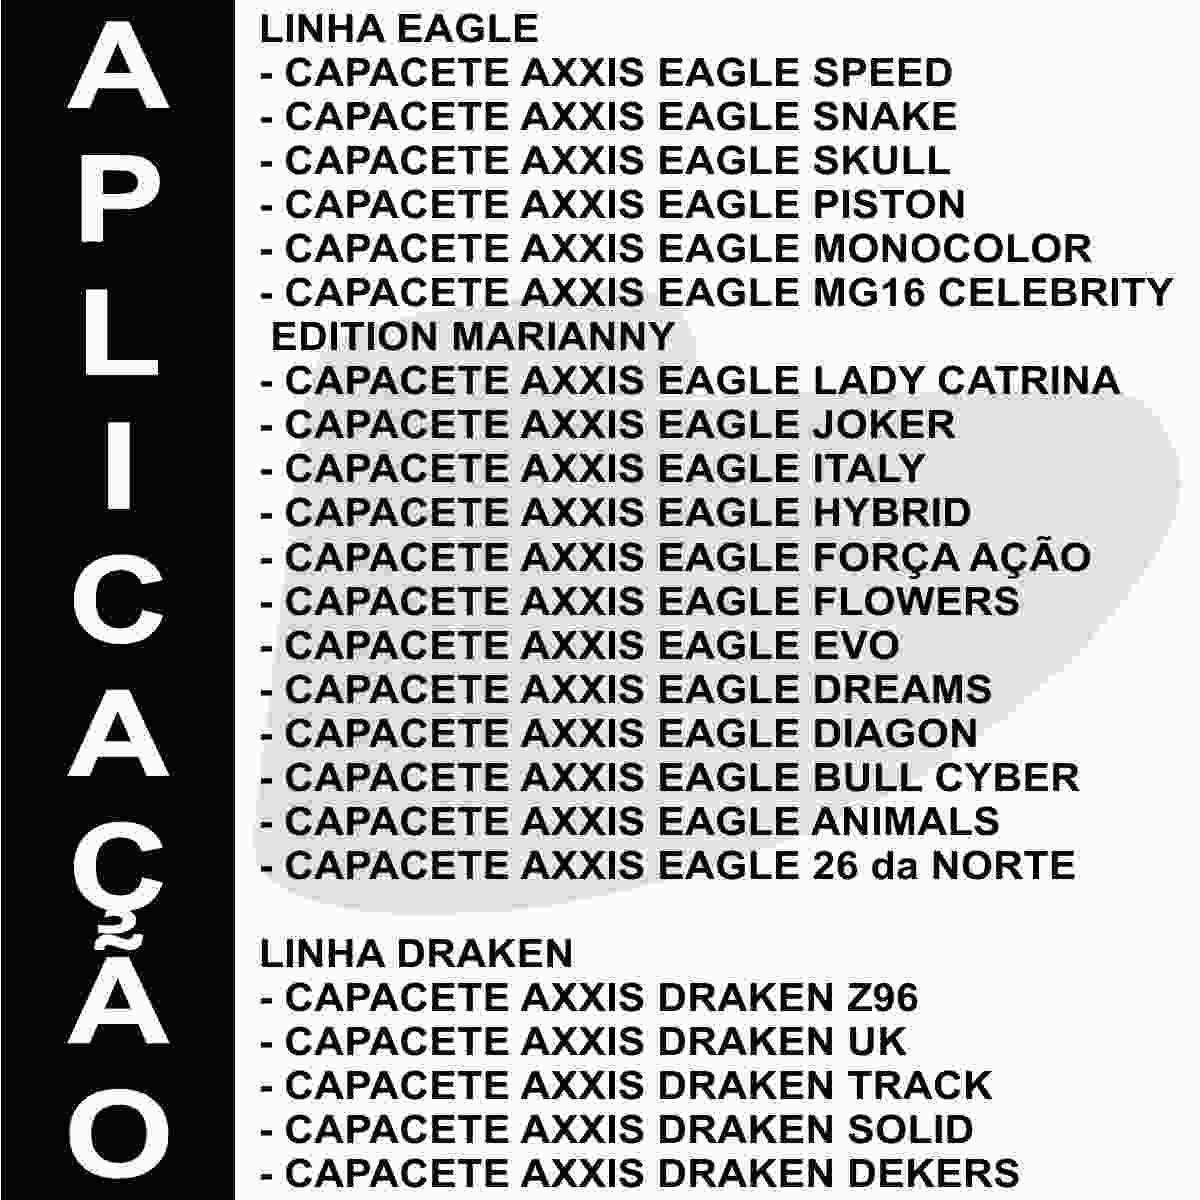 KIT VISEIRA AXXIS EAGLE/DRAKEN DOURADA V18 + SISTEMA DE RETENÇÃO DE VISEIRA